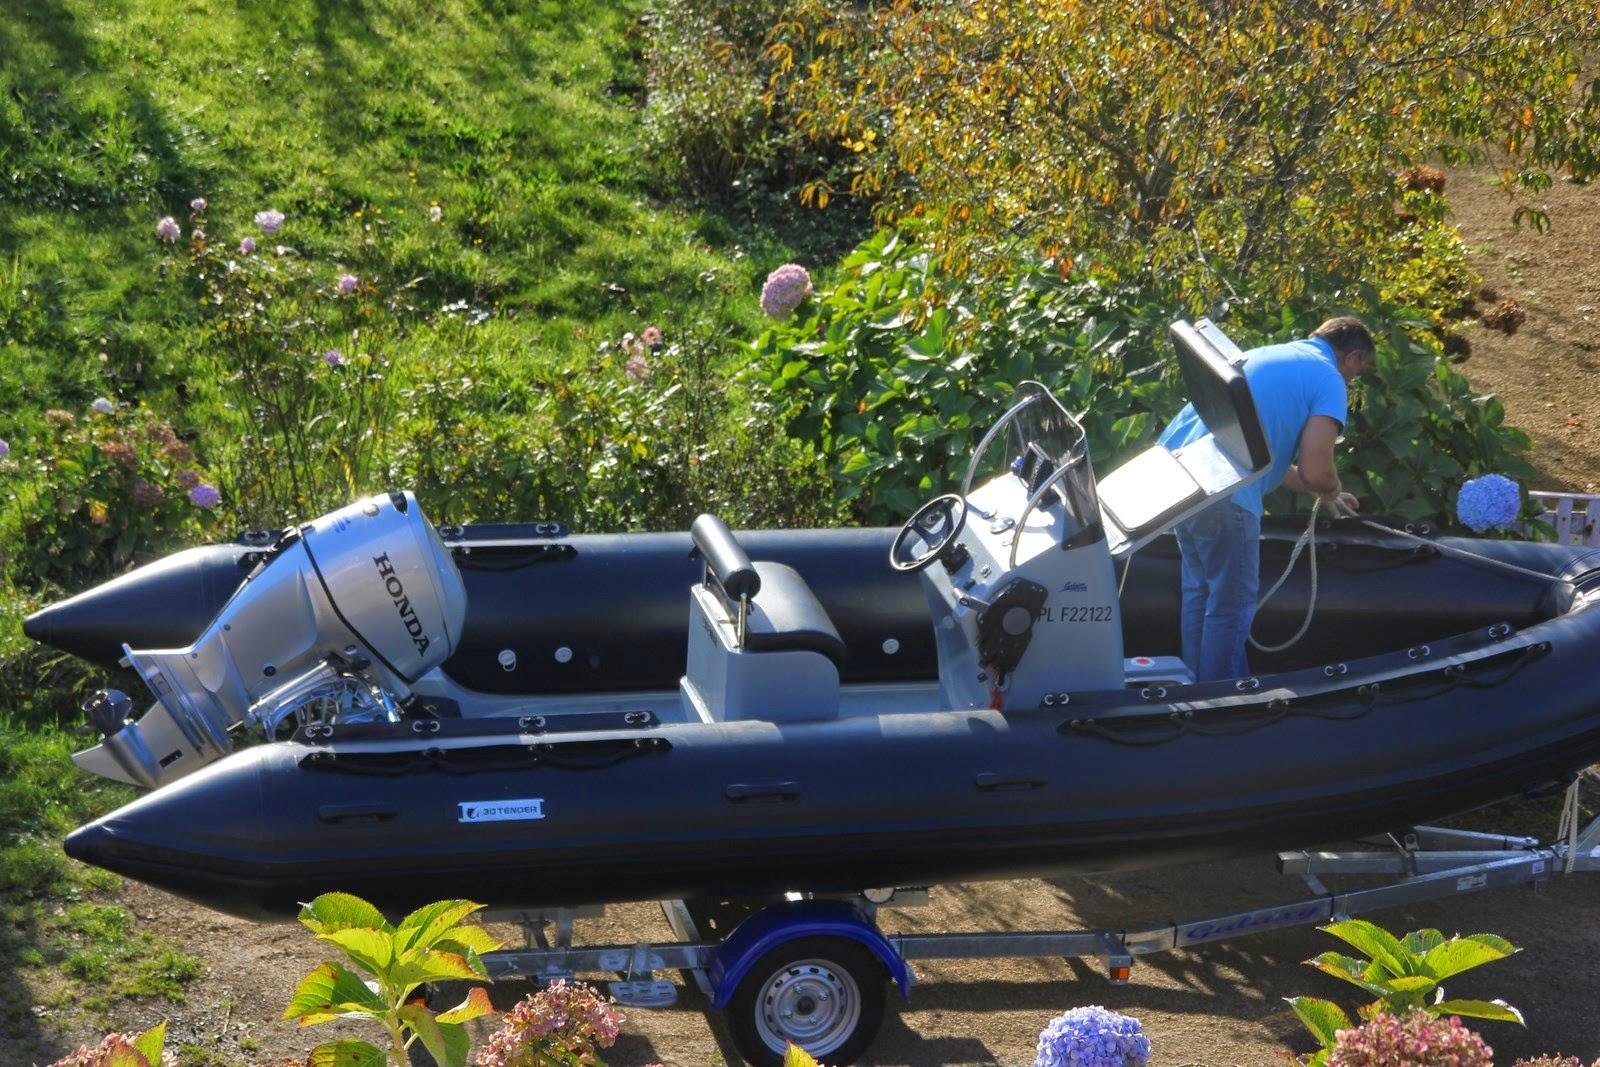 semi rigide, console haute moteur honda 60 ch, remorque mecanorem, pêche